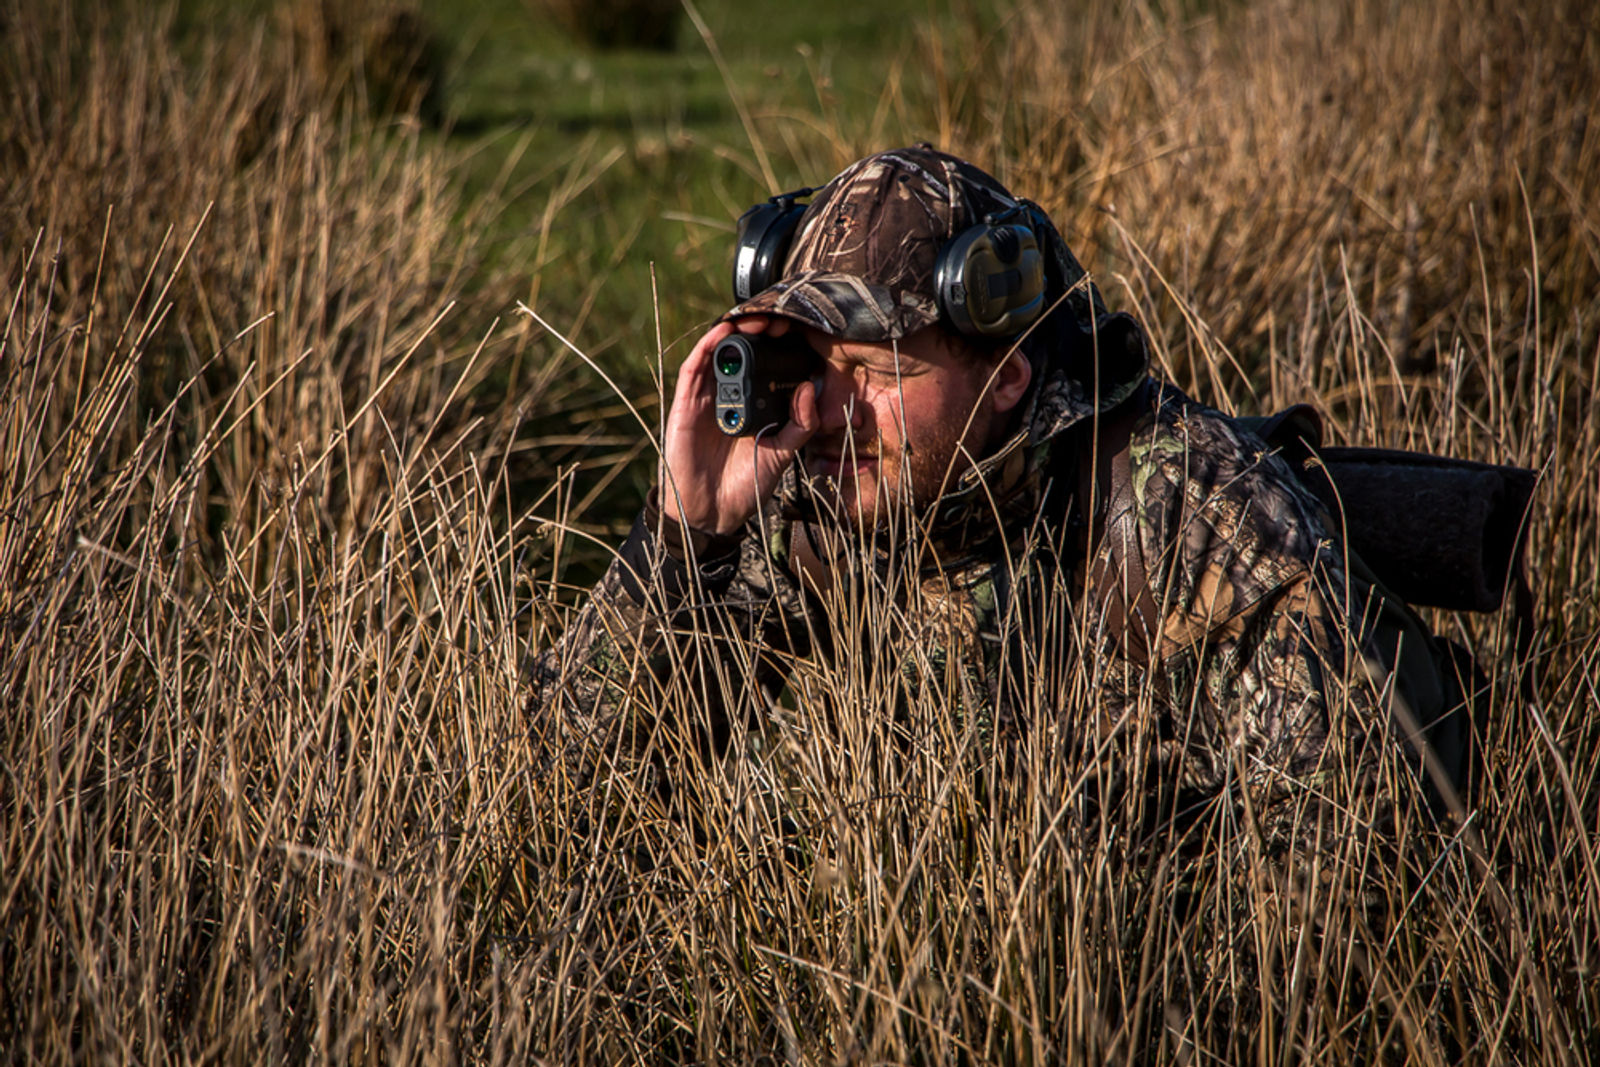 Jagd Entfernungsmesser Vergleich : Entfernungsmesser jagd leupold: zielfernrohre gebraucht & neu optik